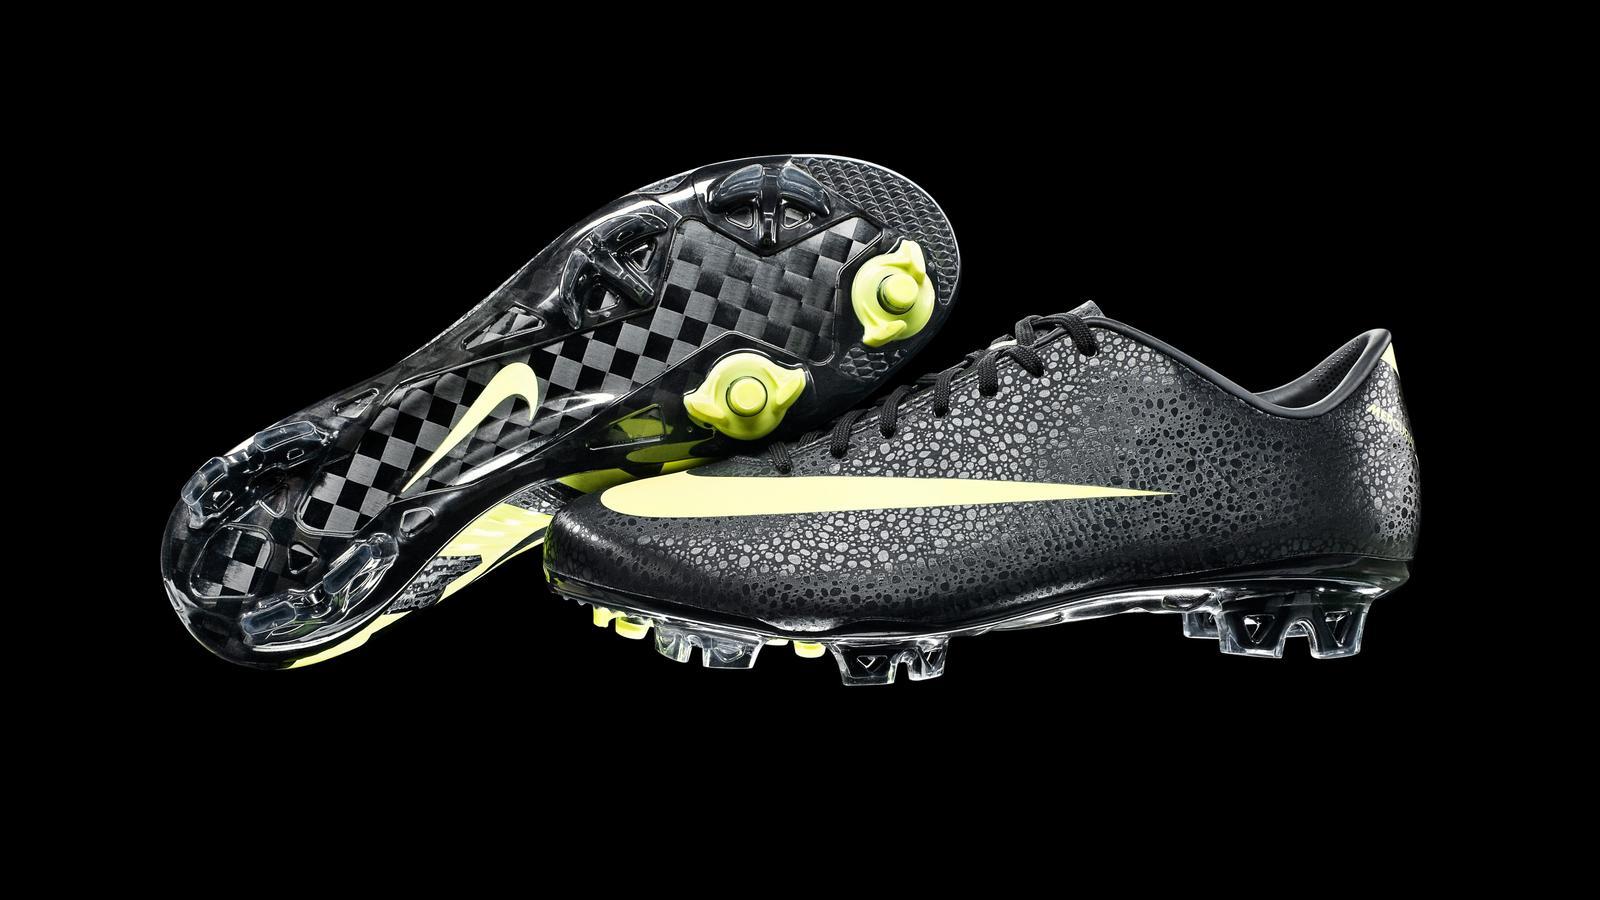 Nike Introduces the CR Mercurial Vapor SuperFly III - Nike ...